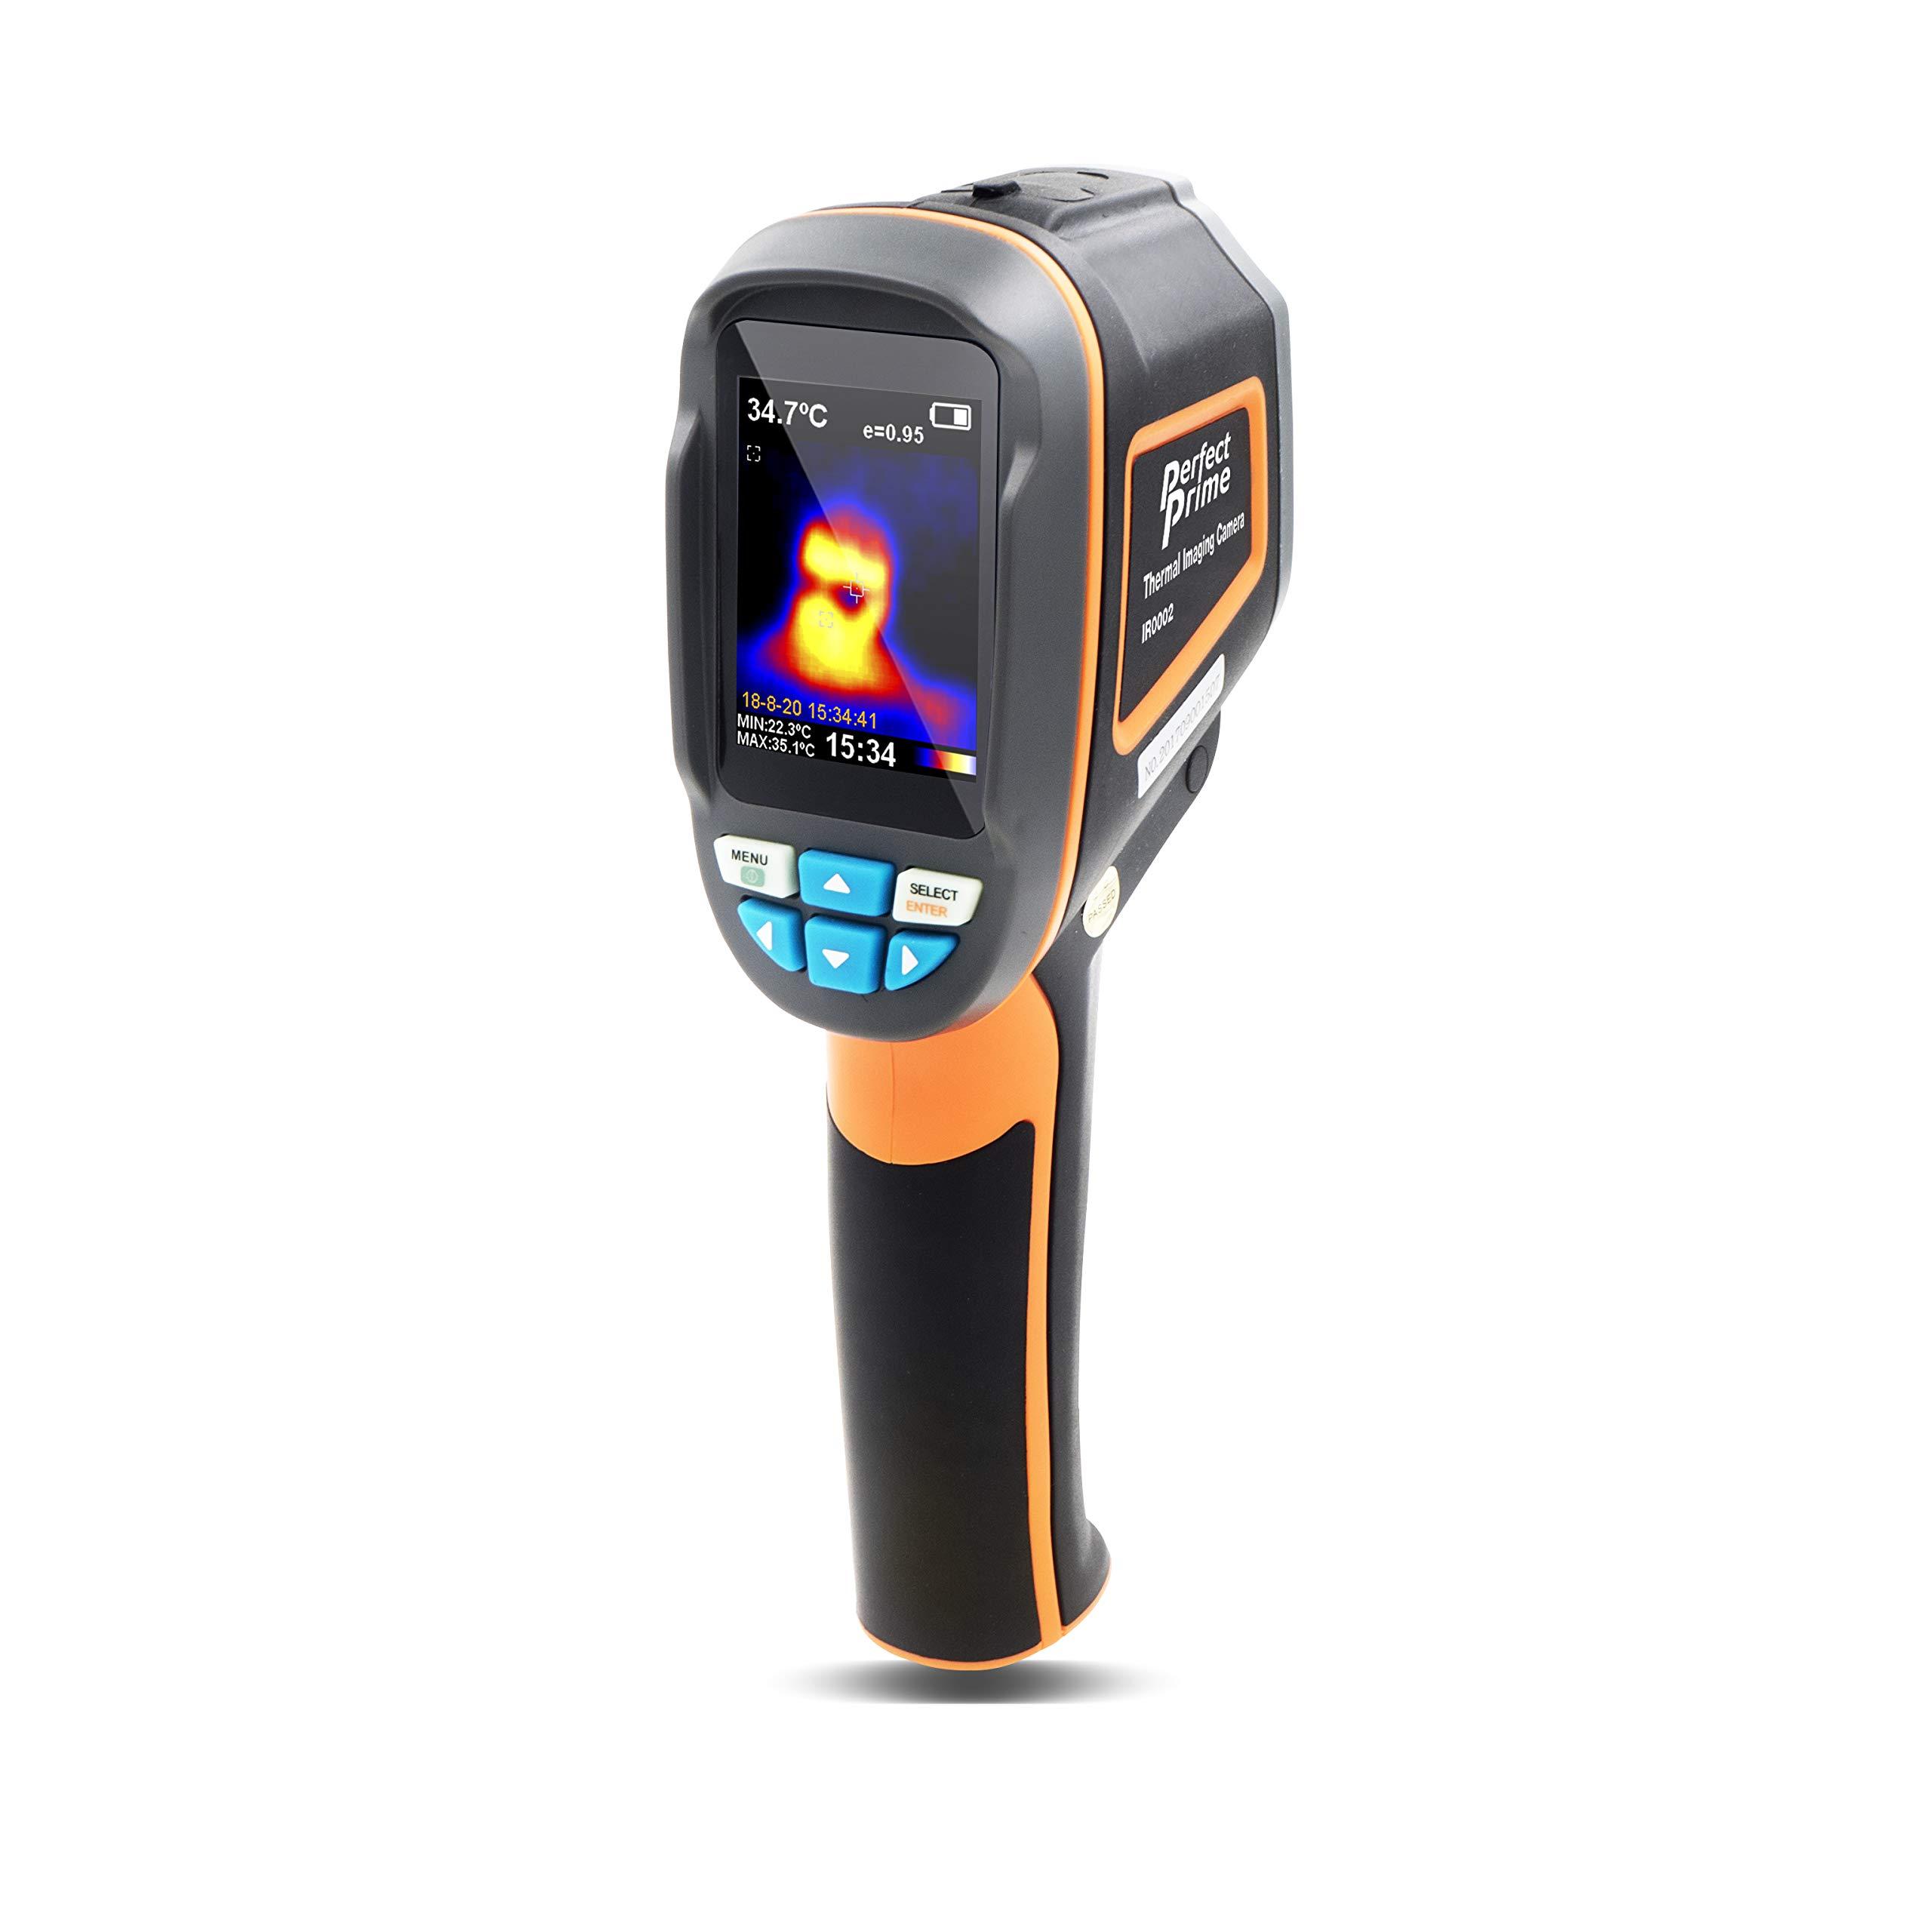 HT-175 Infrared IR Thermal Imaging Camera Inspection 6Hz Refresh Rate Measurer